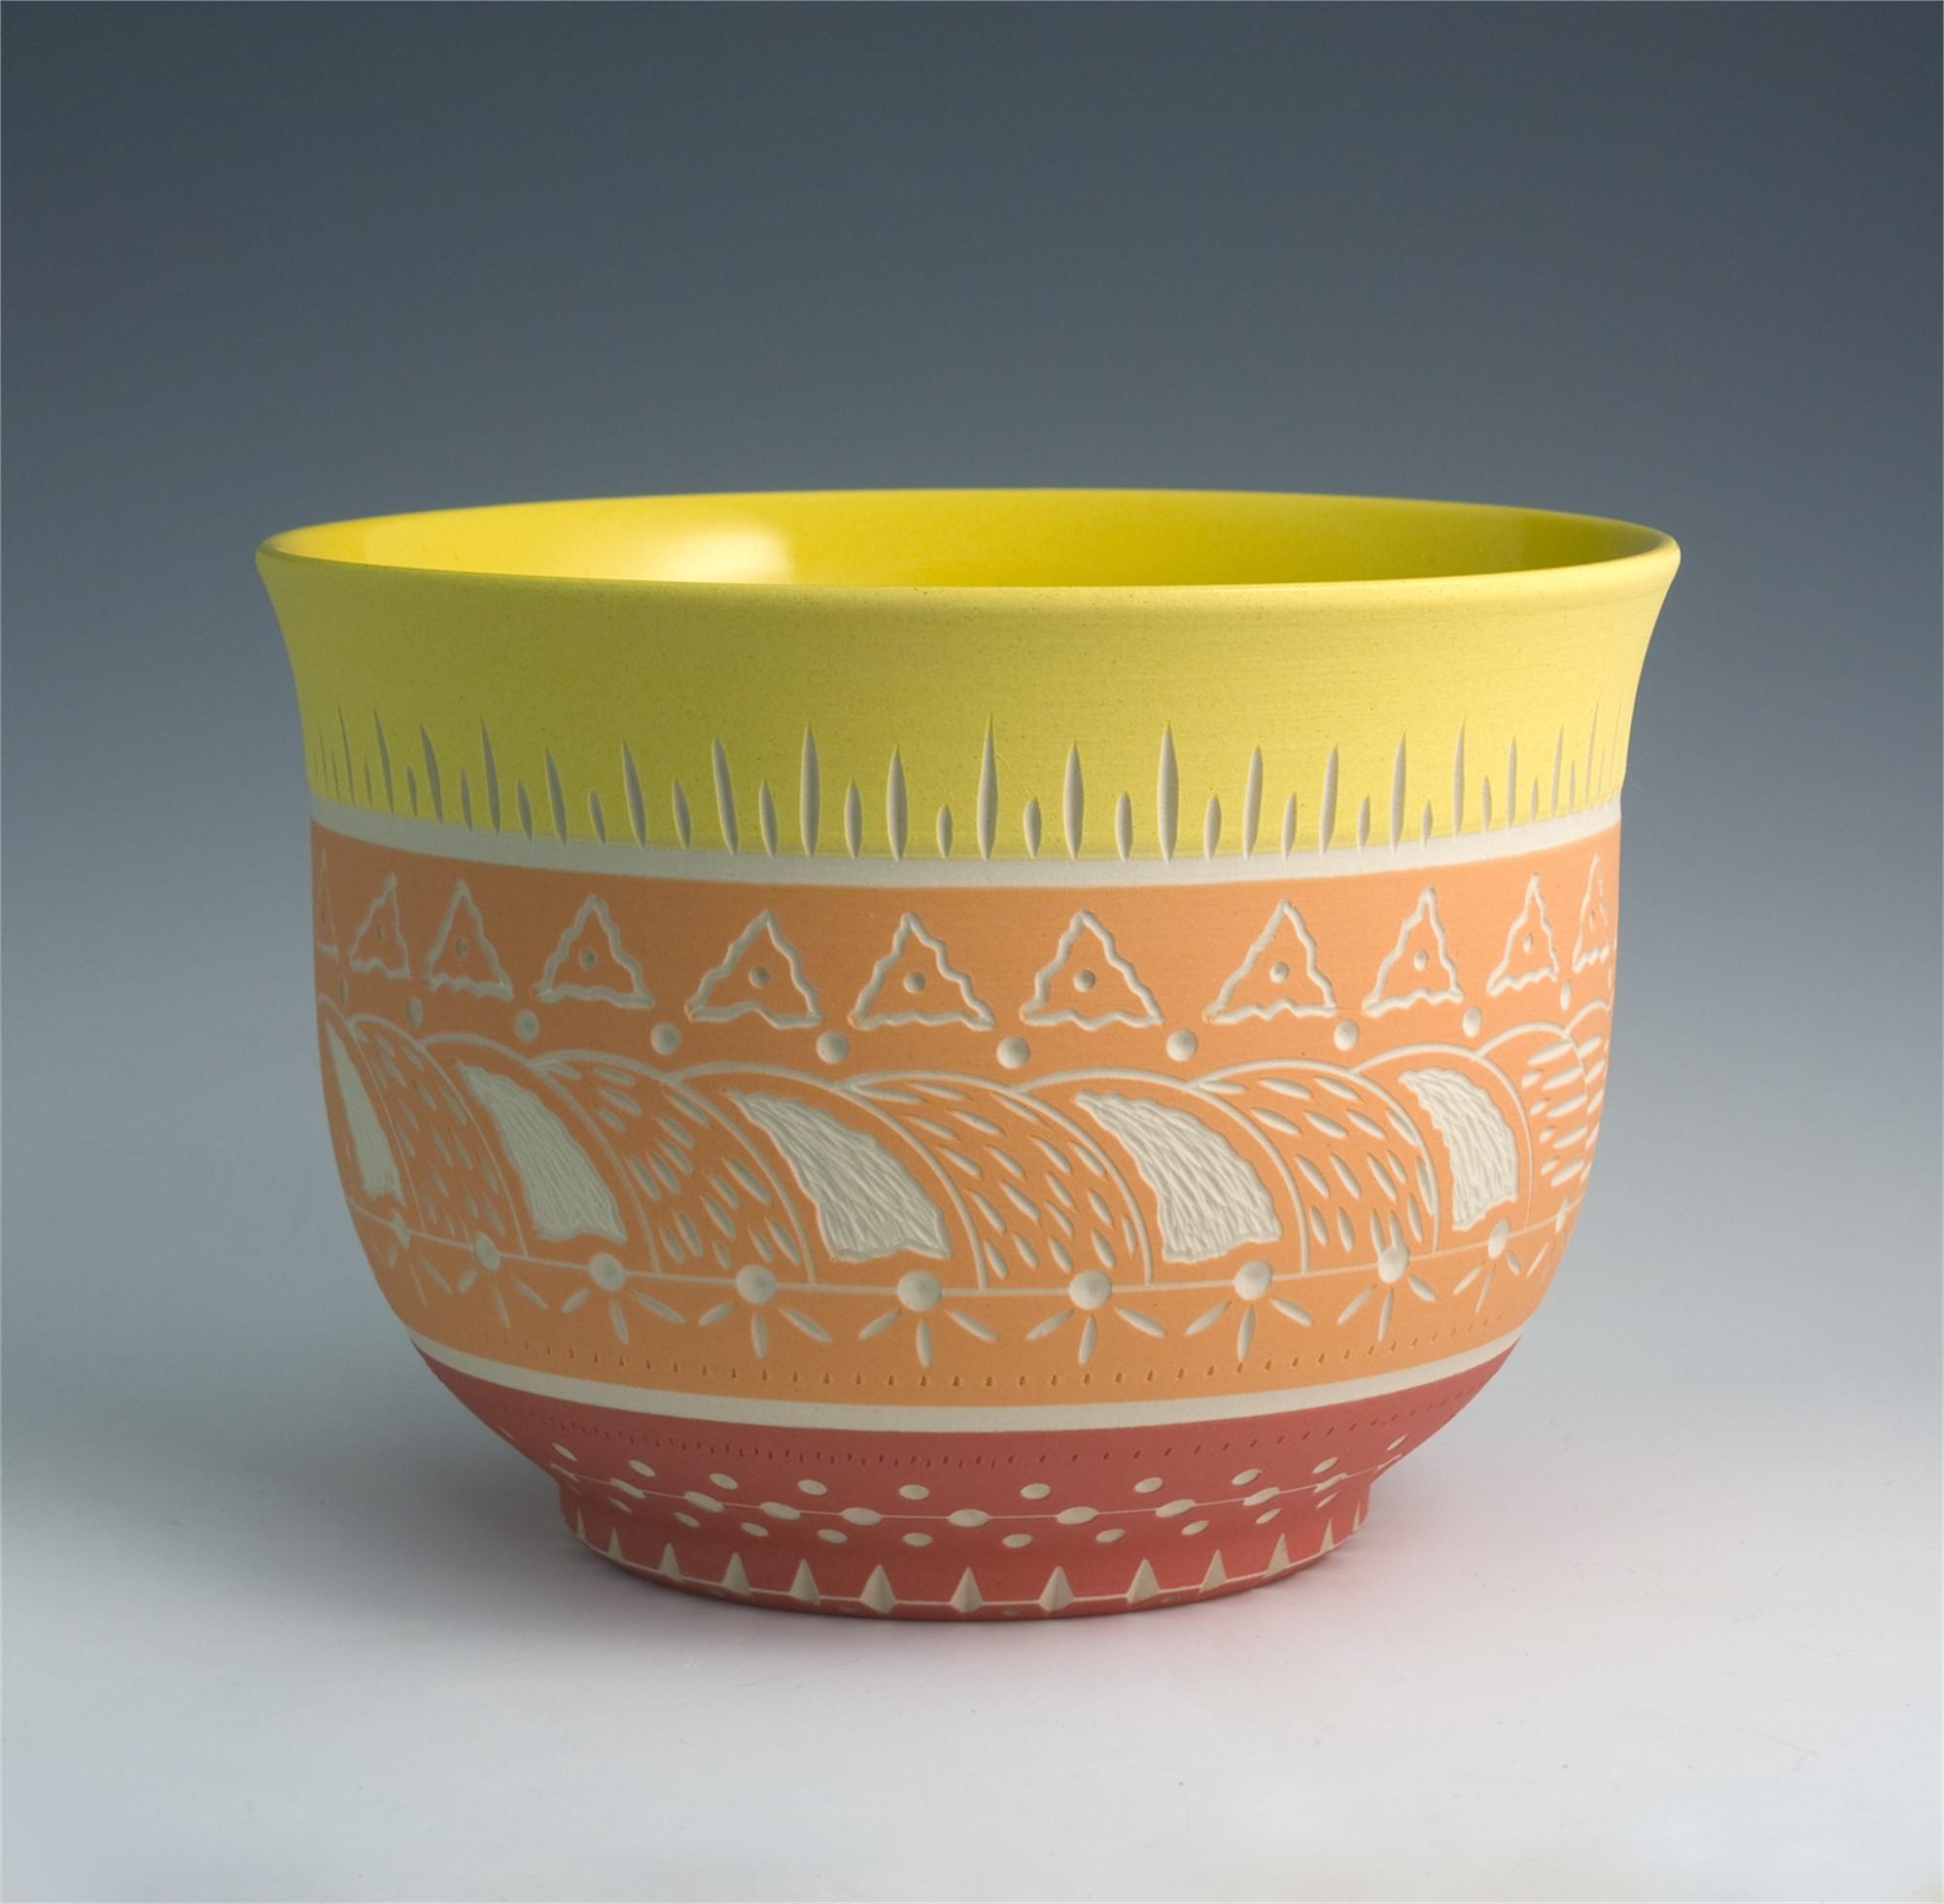 Bowl (Yellow/Orange) by Chris Casey